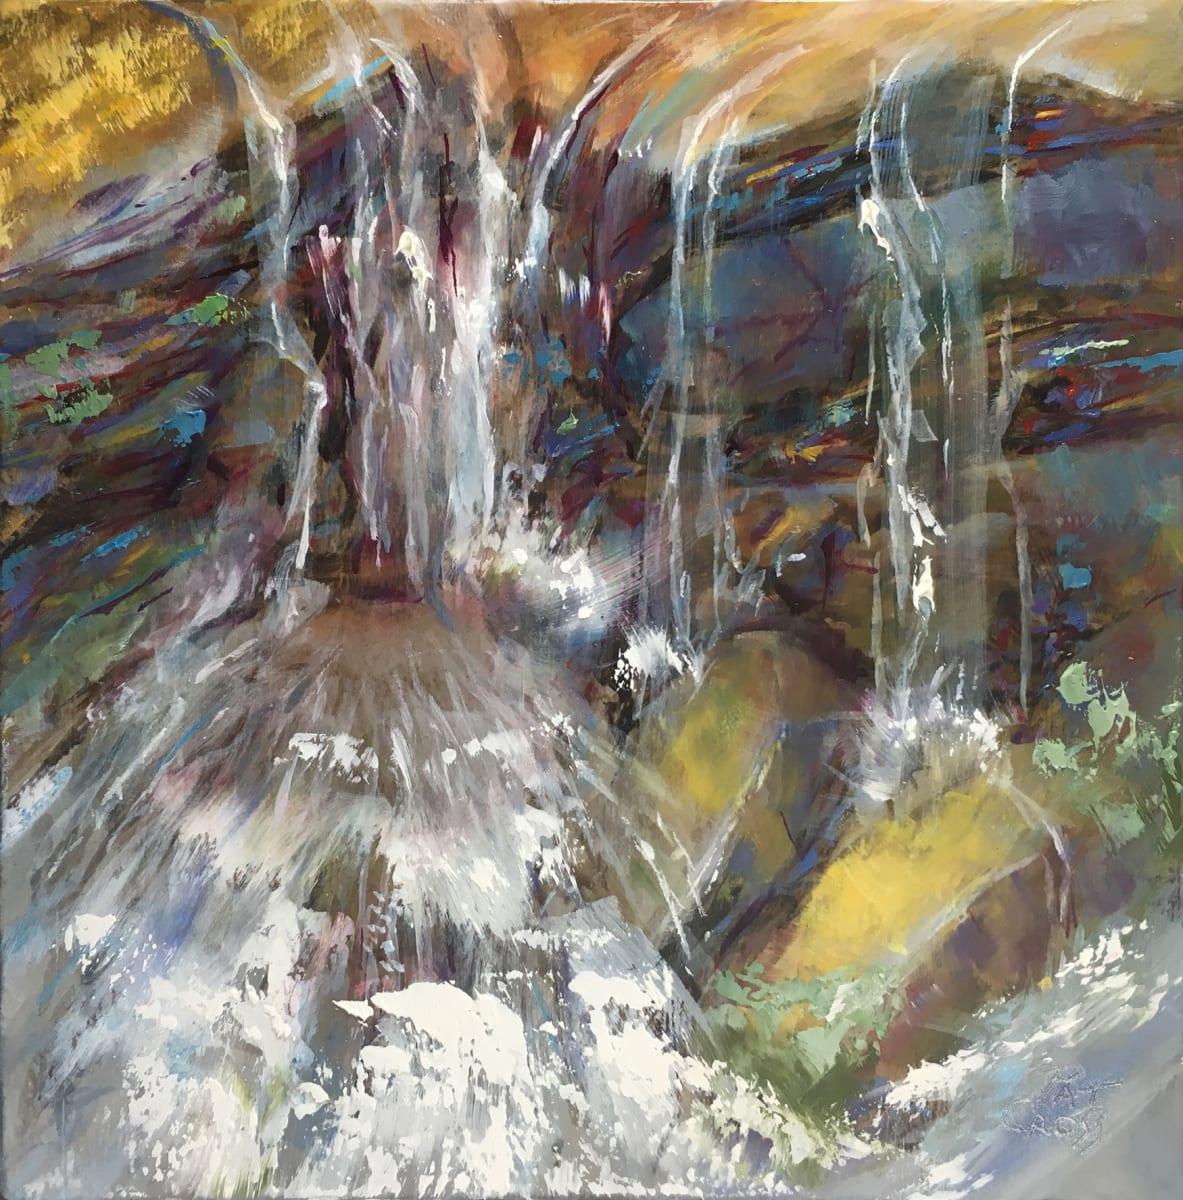 The Splash by Pat Cross